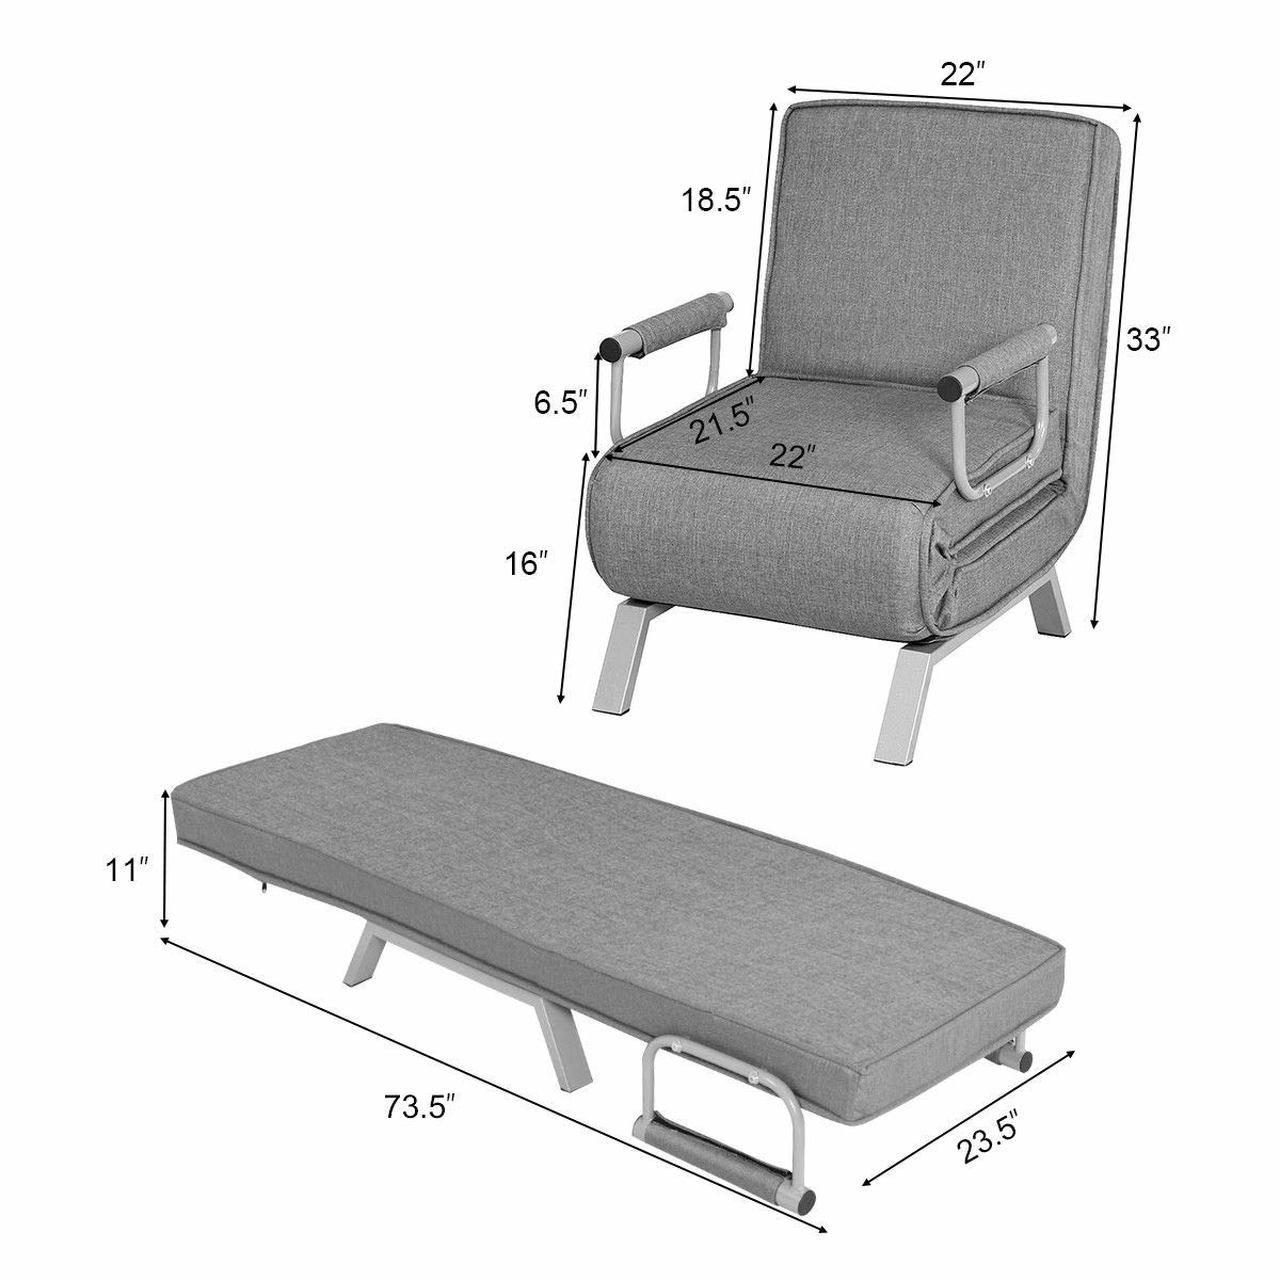 Rv Convertible Sofa Bed Folding Arm Chair Recpro In 2020 Convertible Sofa Bed Sofa Bed Convertible Sofa